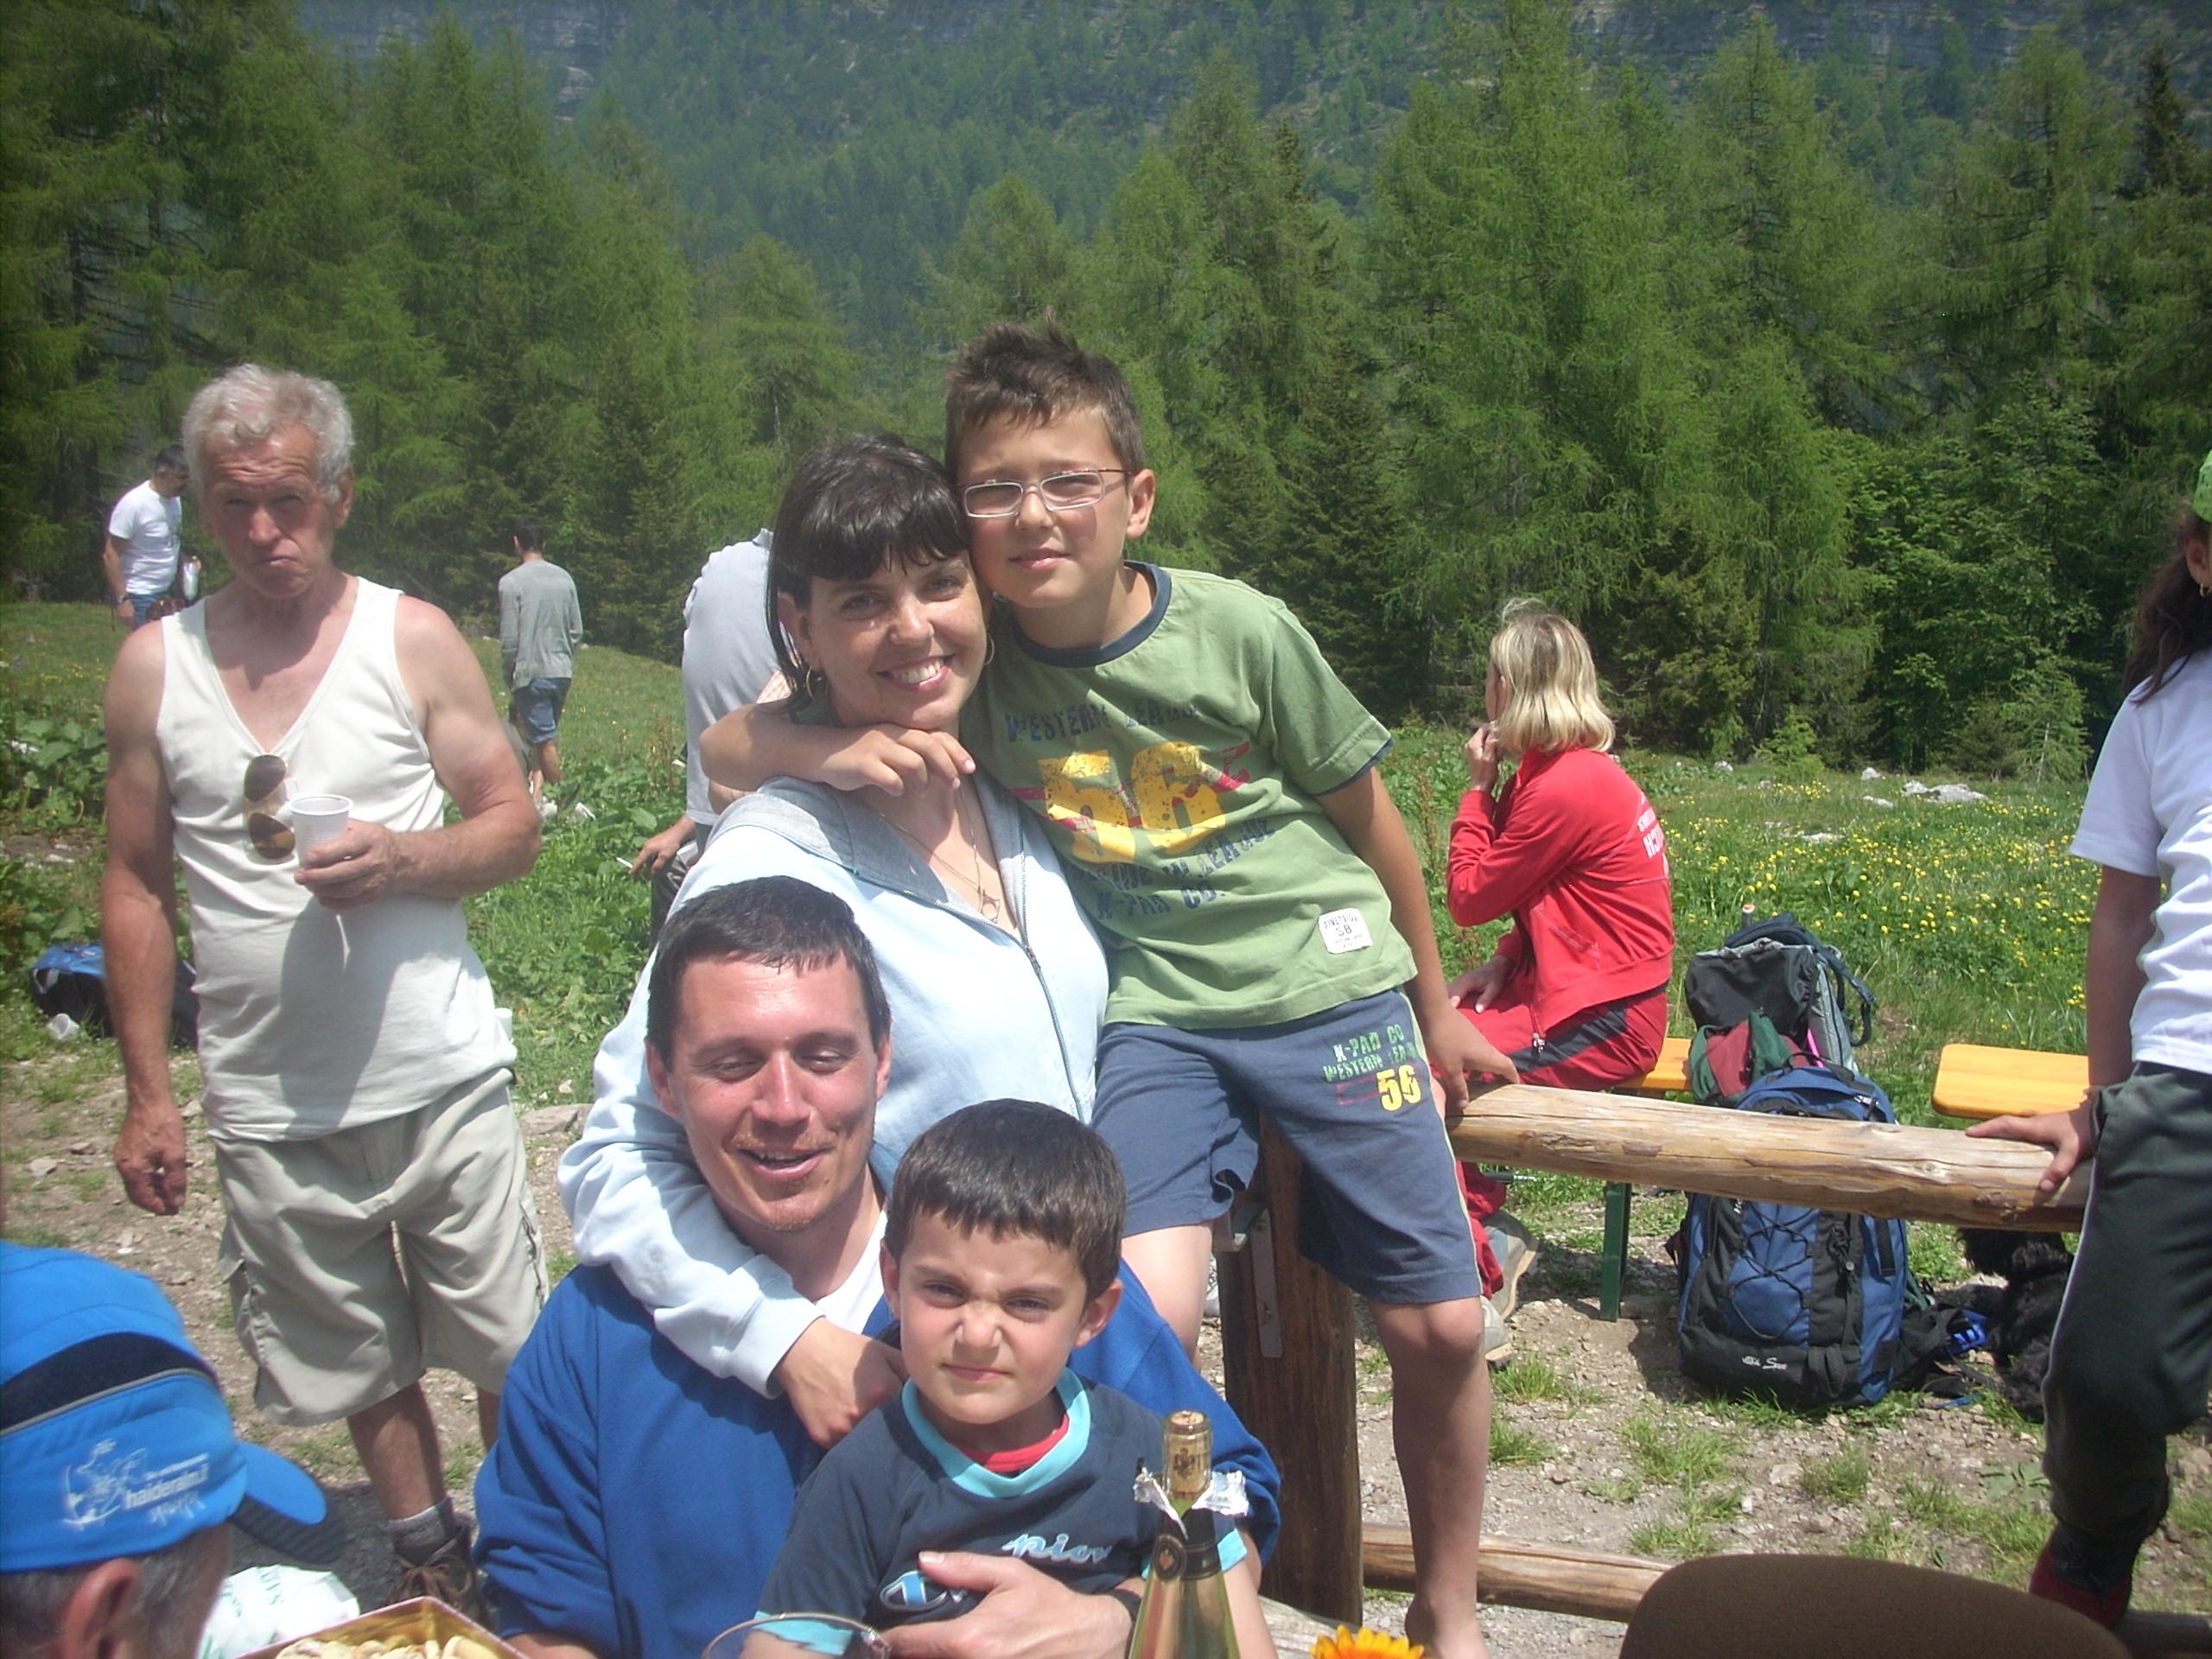 La mia splendida famiglia